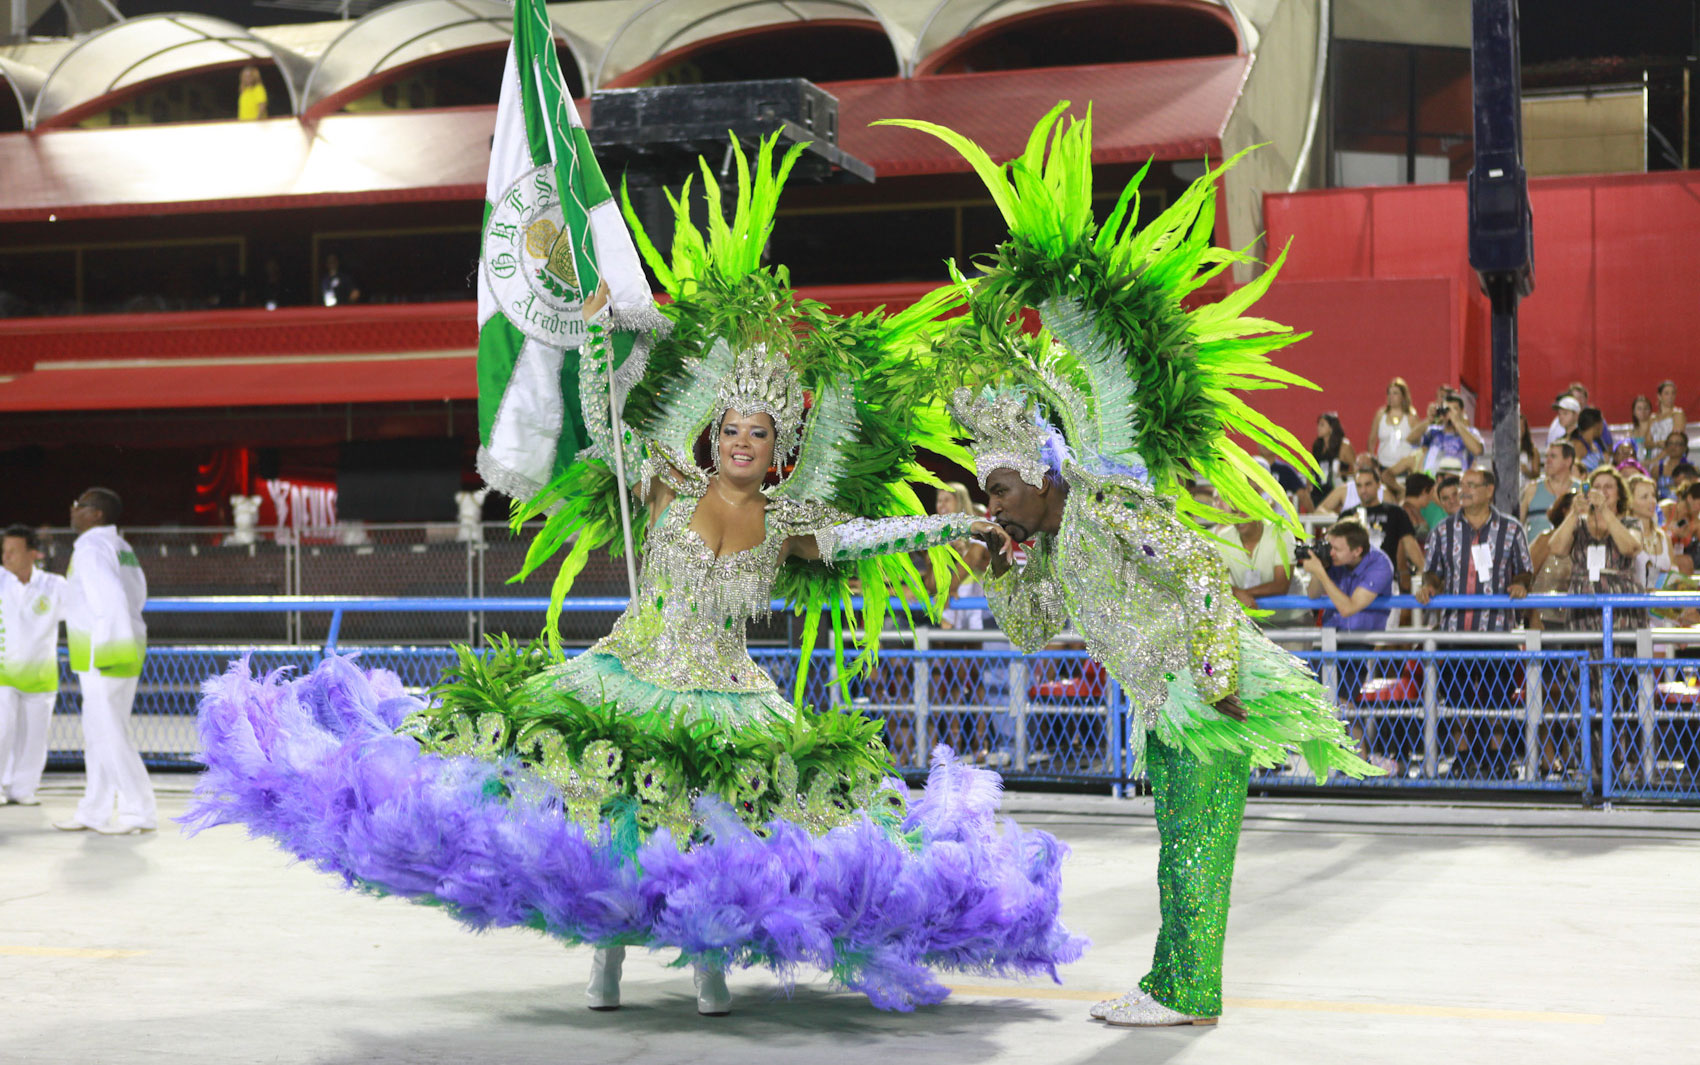 Mestre-sala e porta-bandeira durante desfile da Acadêmicos de Santa Cruz